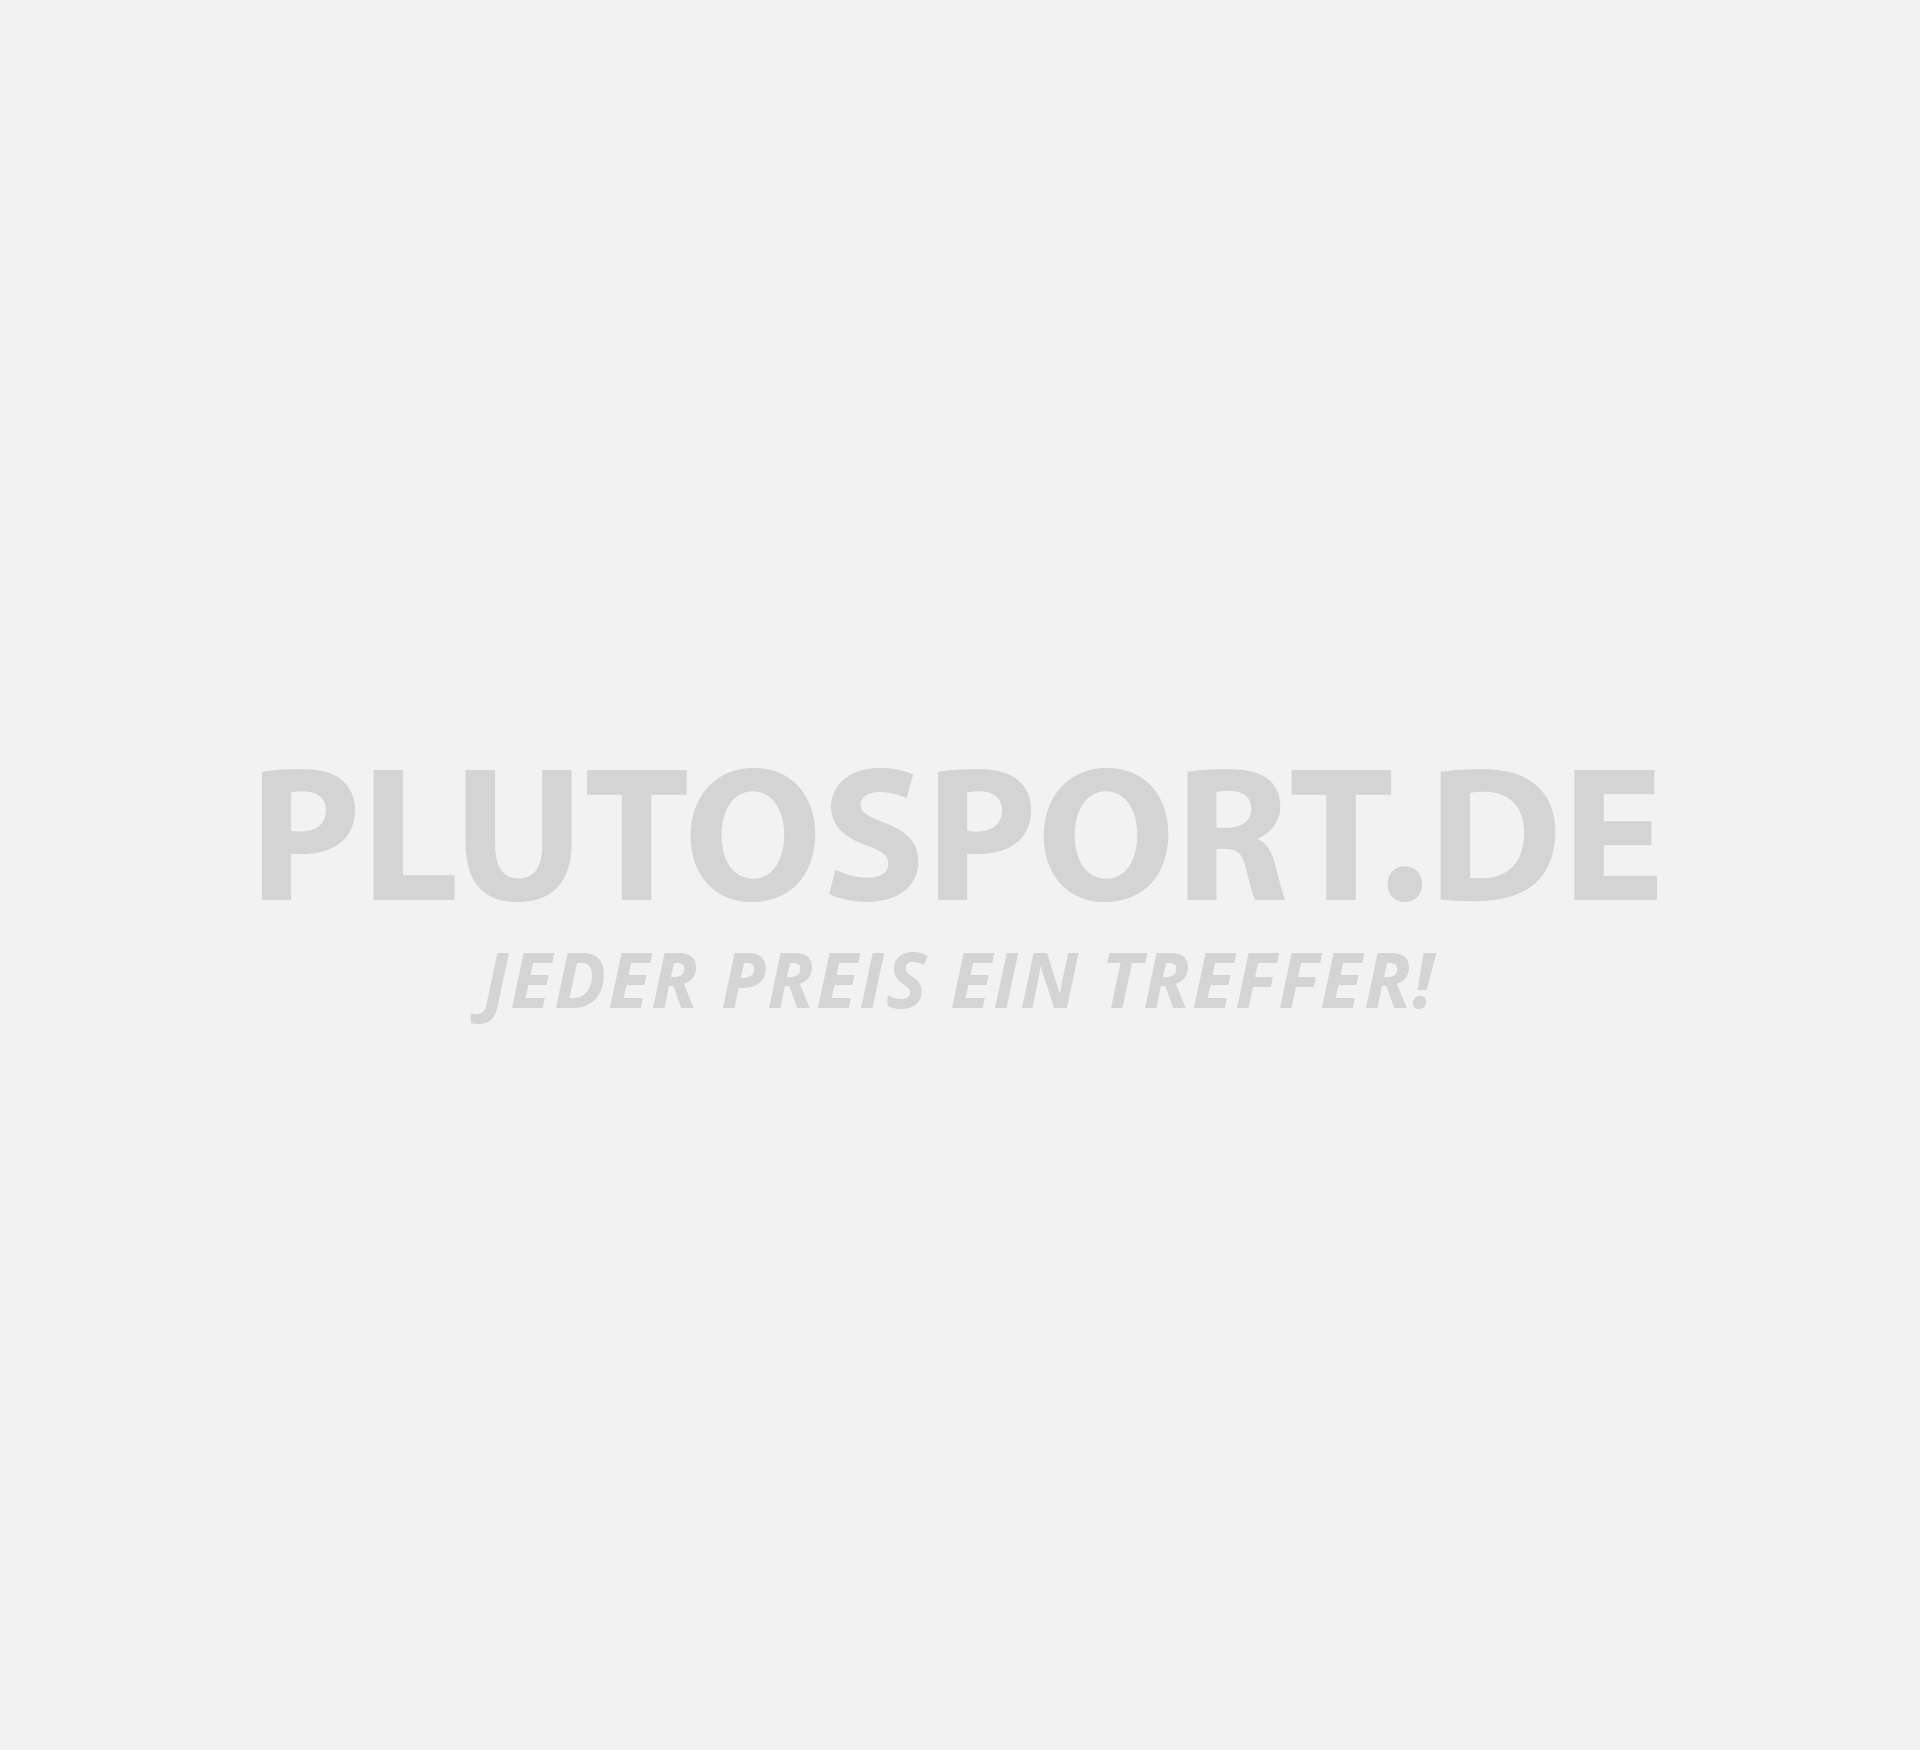 Nijdam Rollschuhe Semi-Softboot für Kinder (verstellbar)